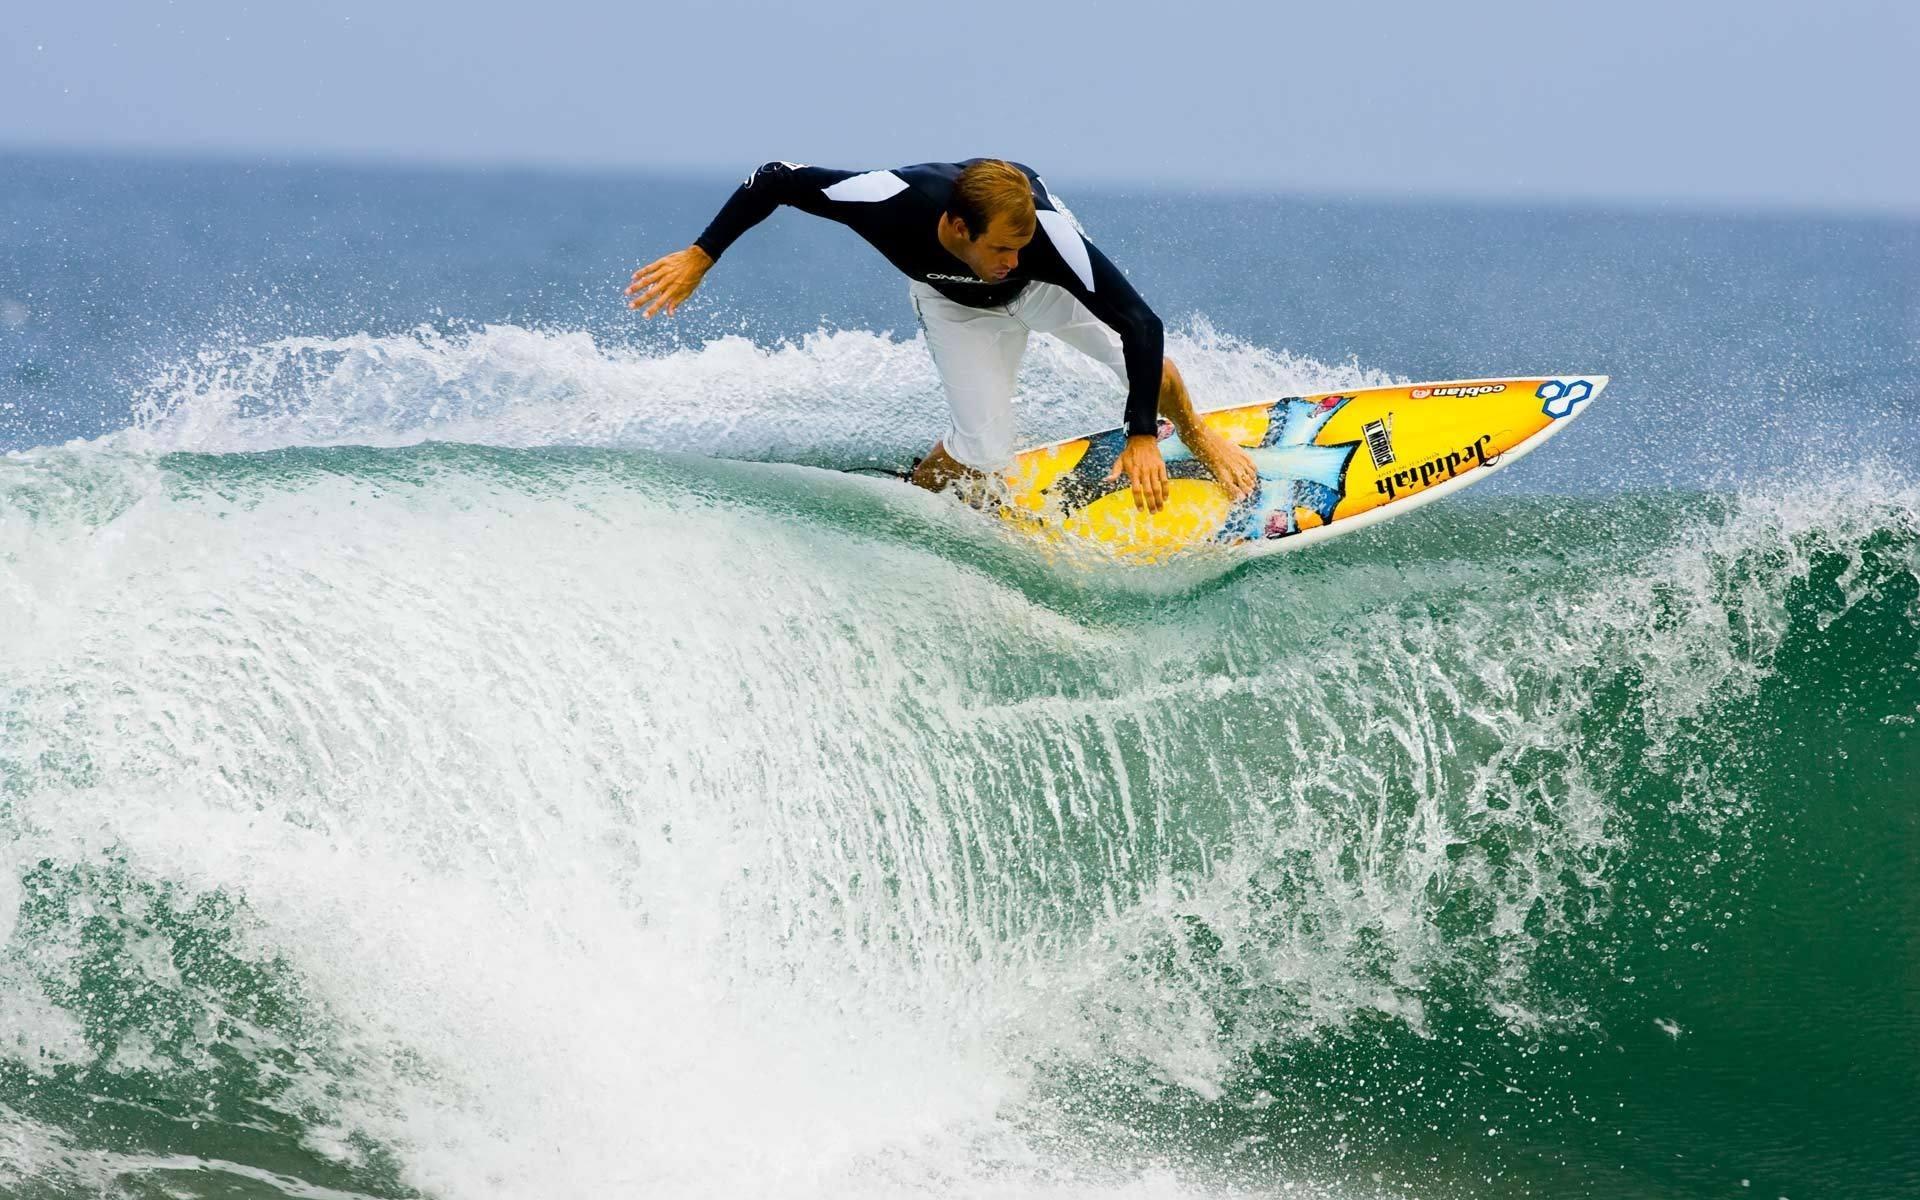 Water Surfing wallpaper 154222 1920x1200